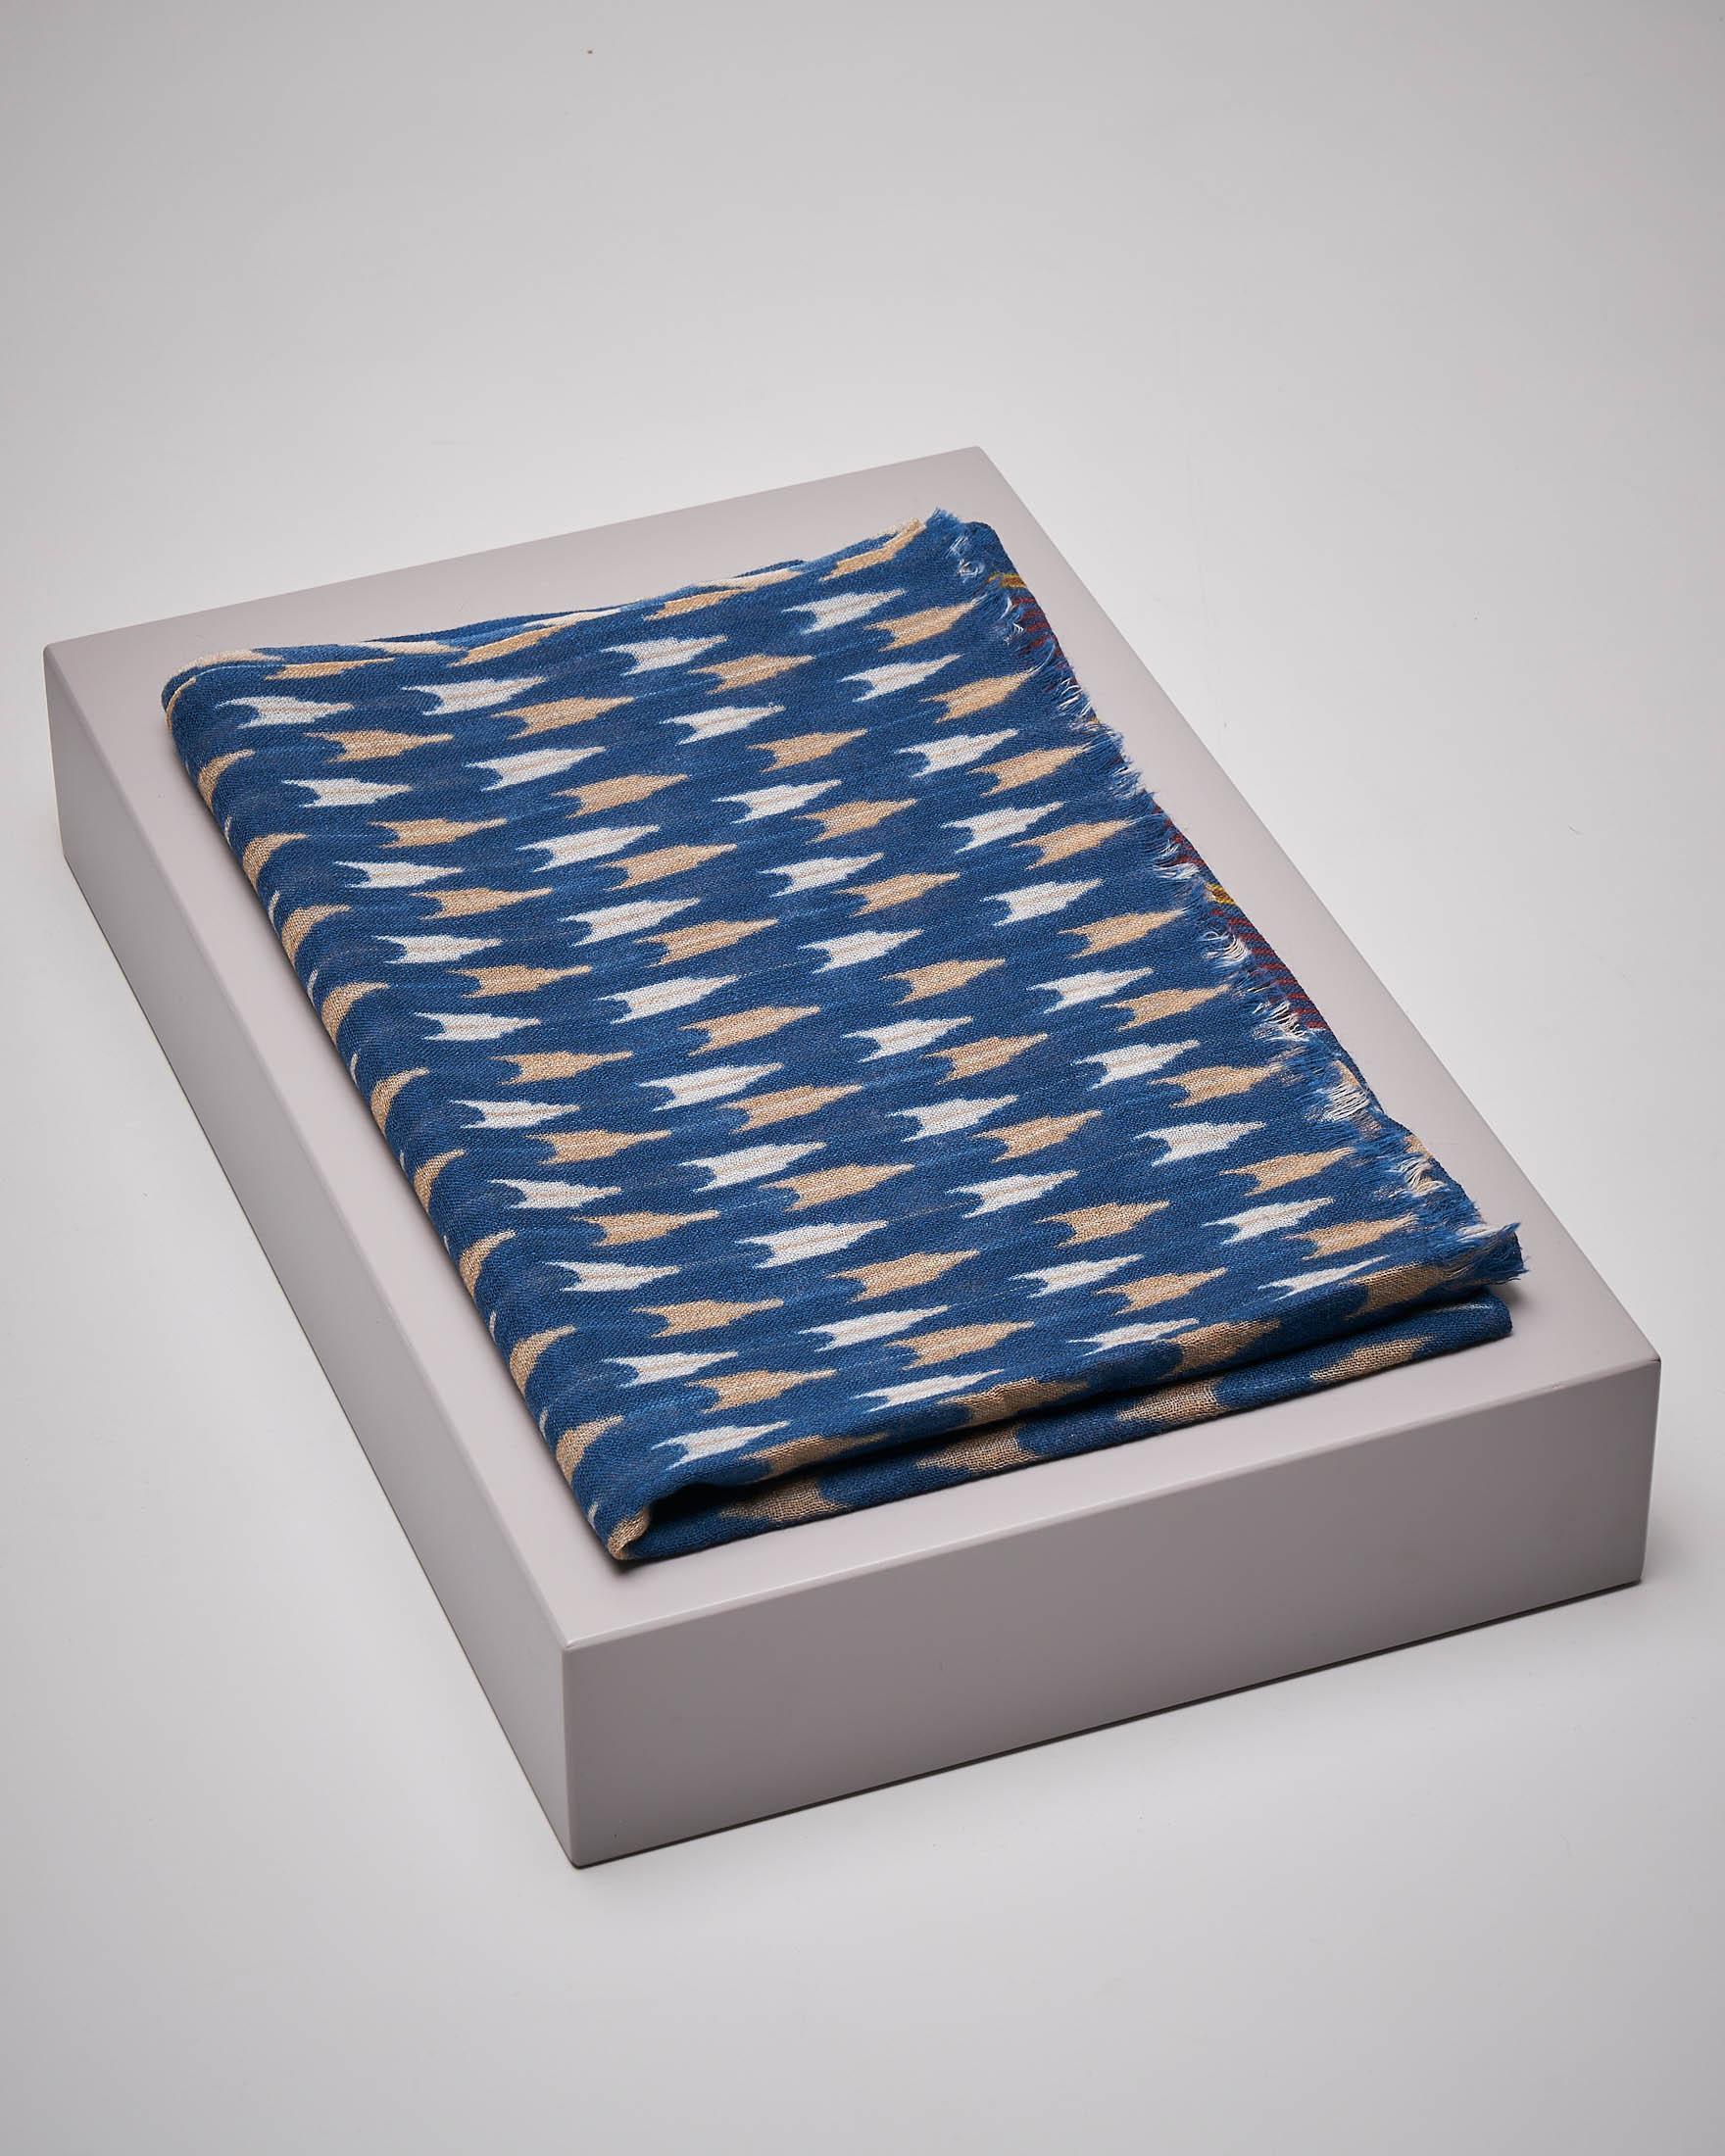 Sciarpa blu in lana fantasia